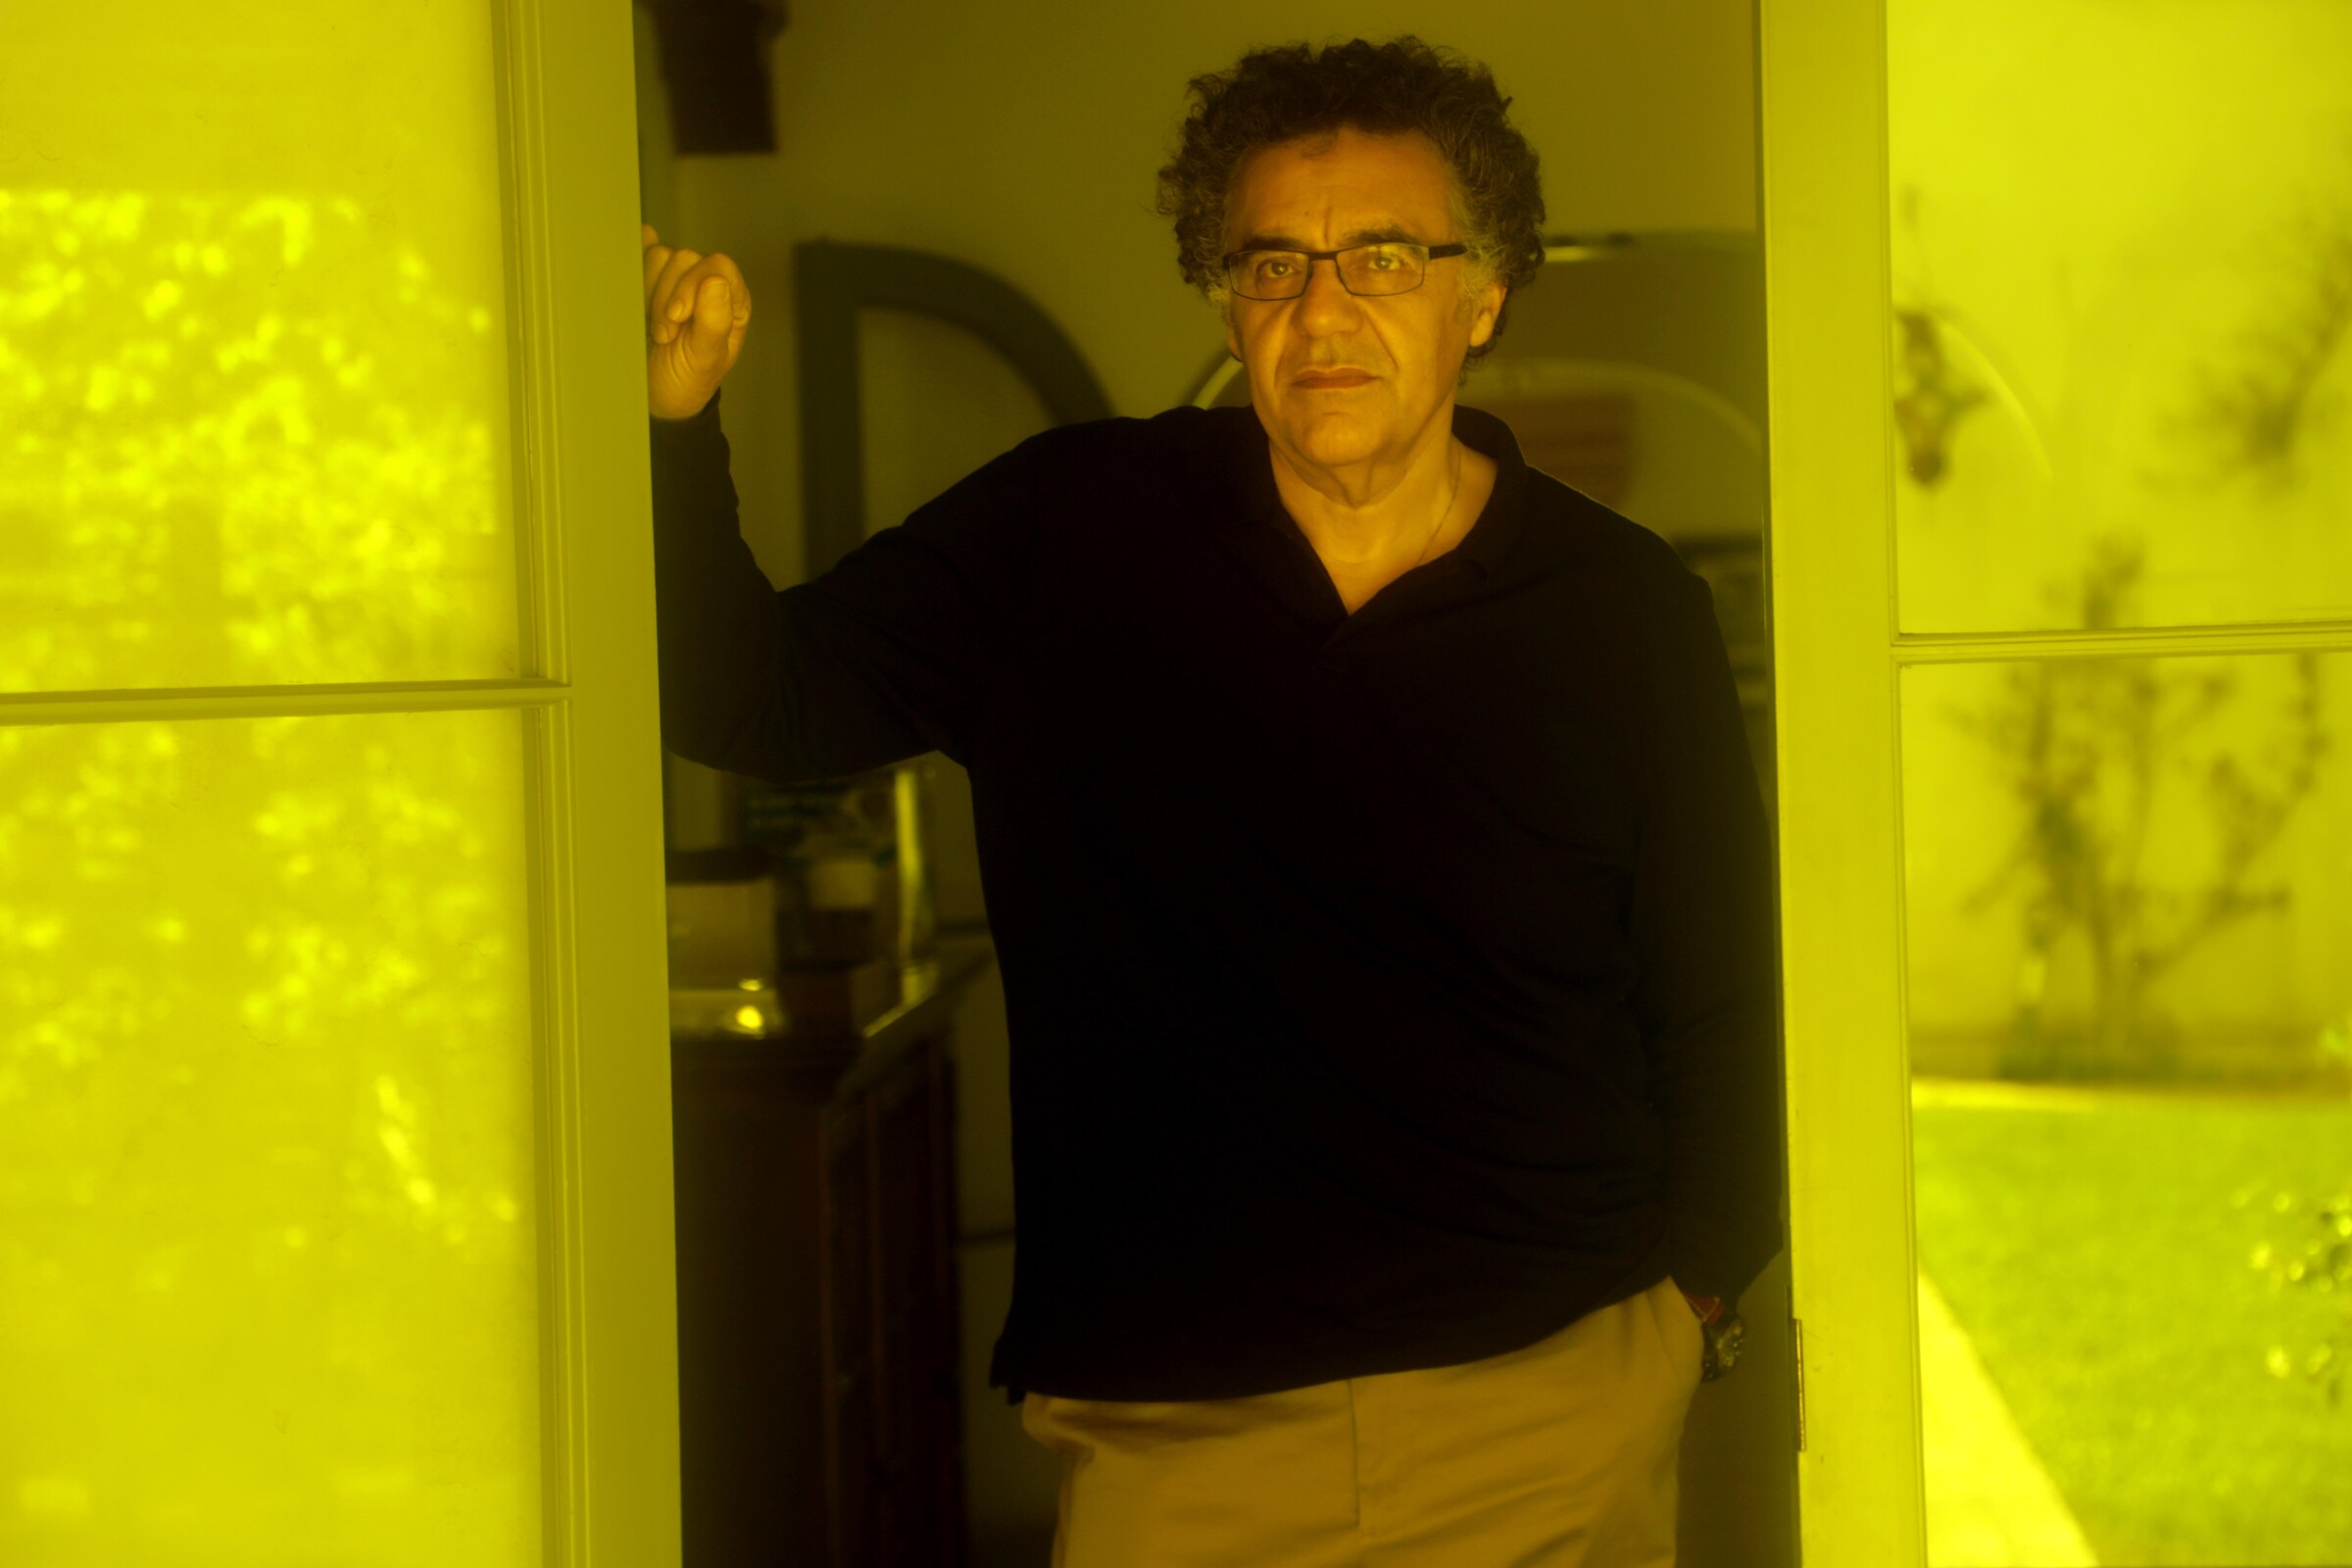 Rodrigo Garcia, looking serious, stands between a set of glass doors that reflect yellow light